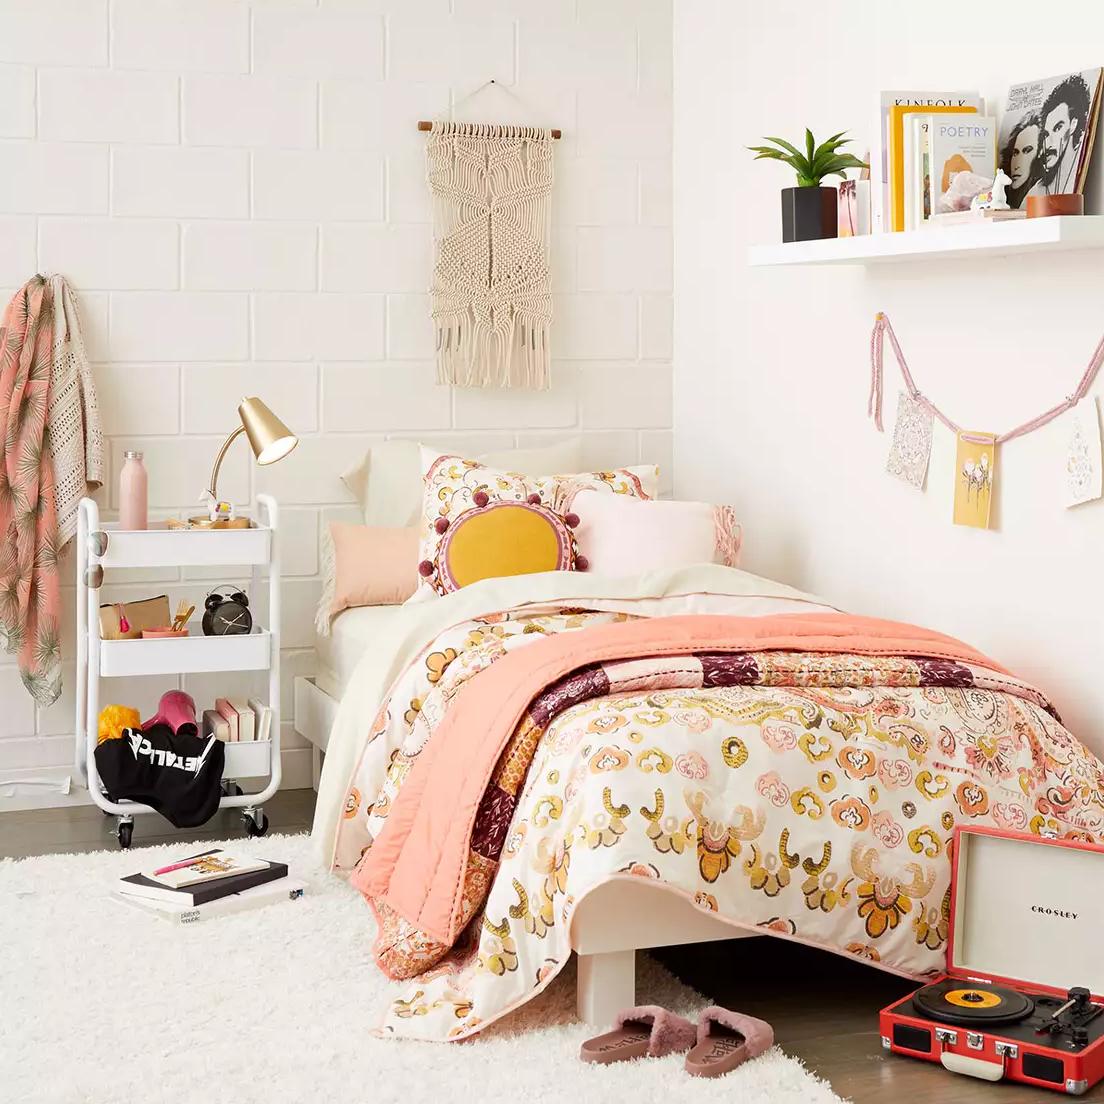 Dorm furniture target Room Chairs Kupinaco Target College Dorm Decor 2018 Best Dorm Finds To Buy At Target